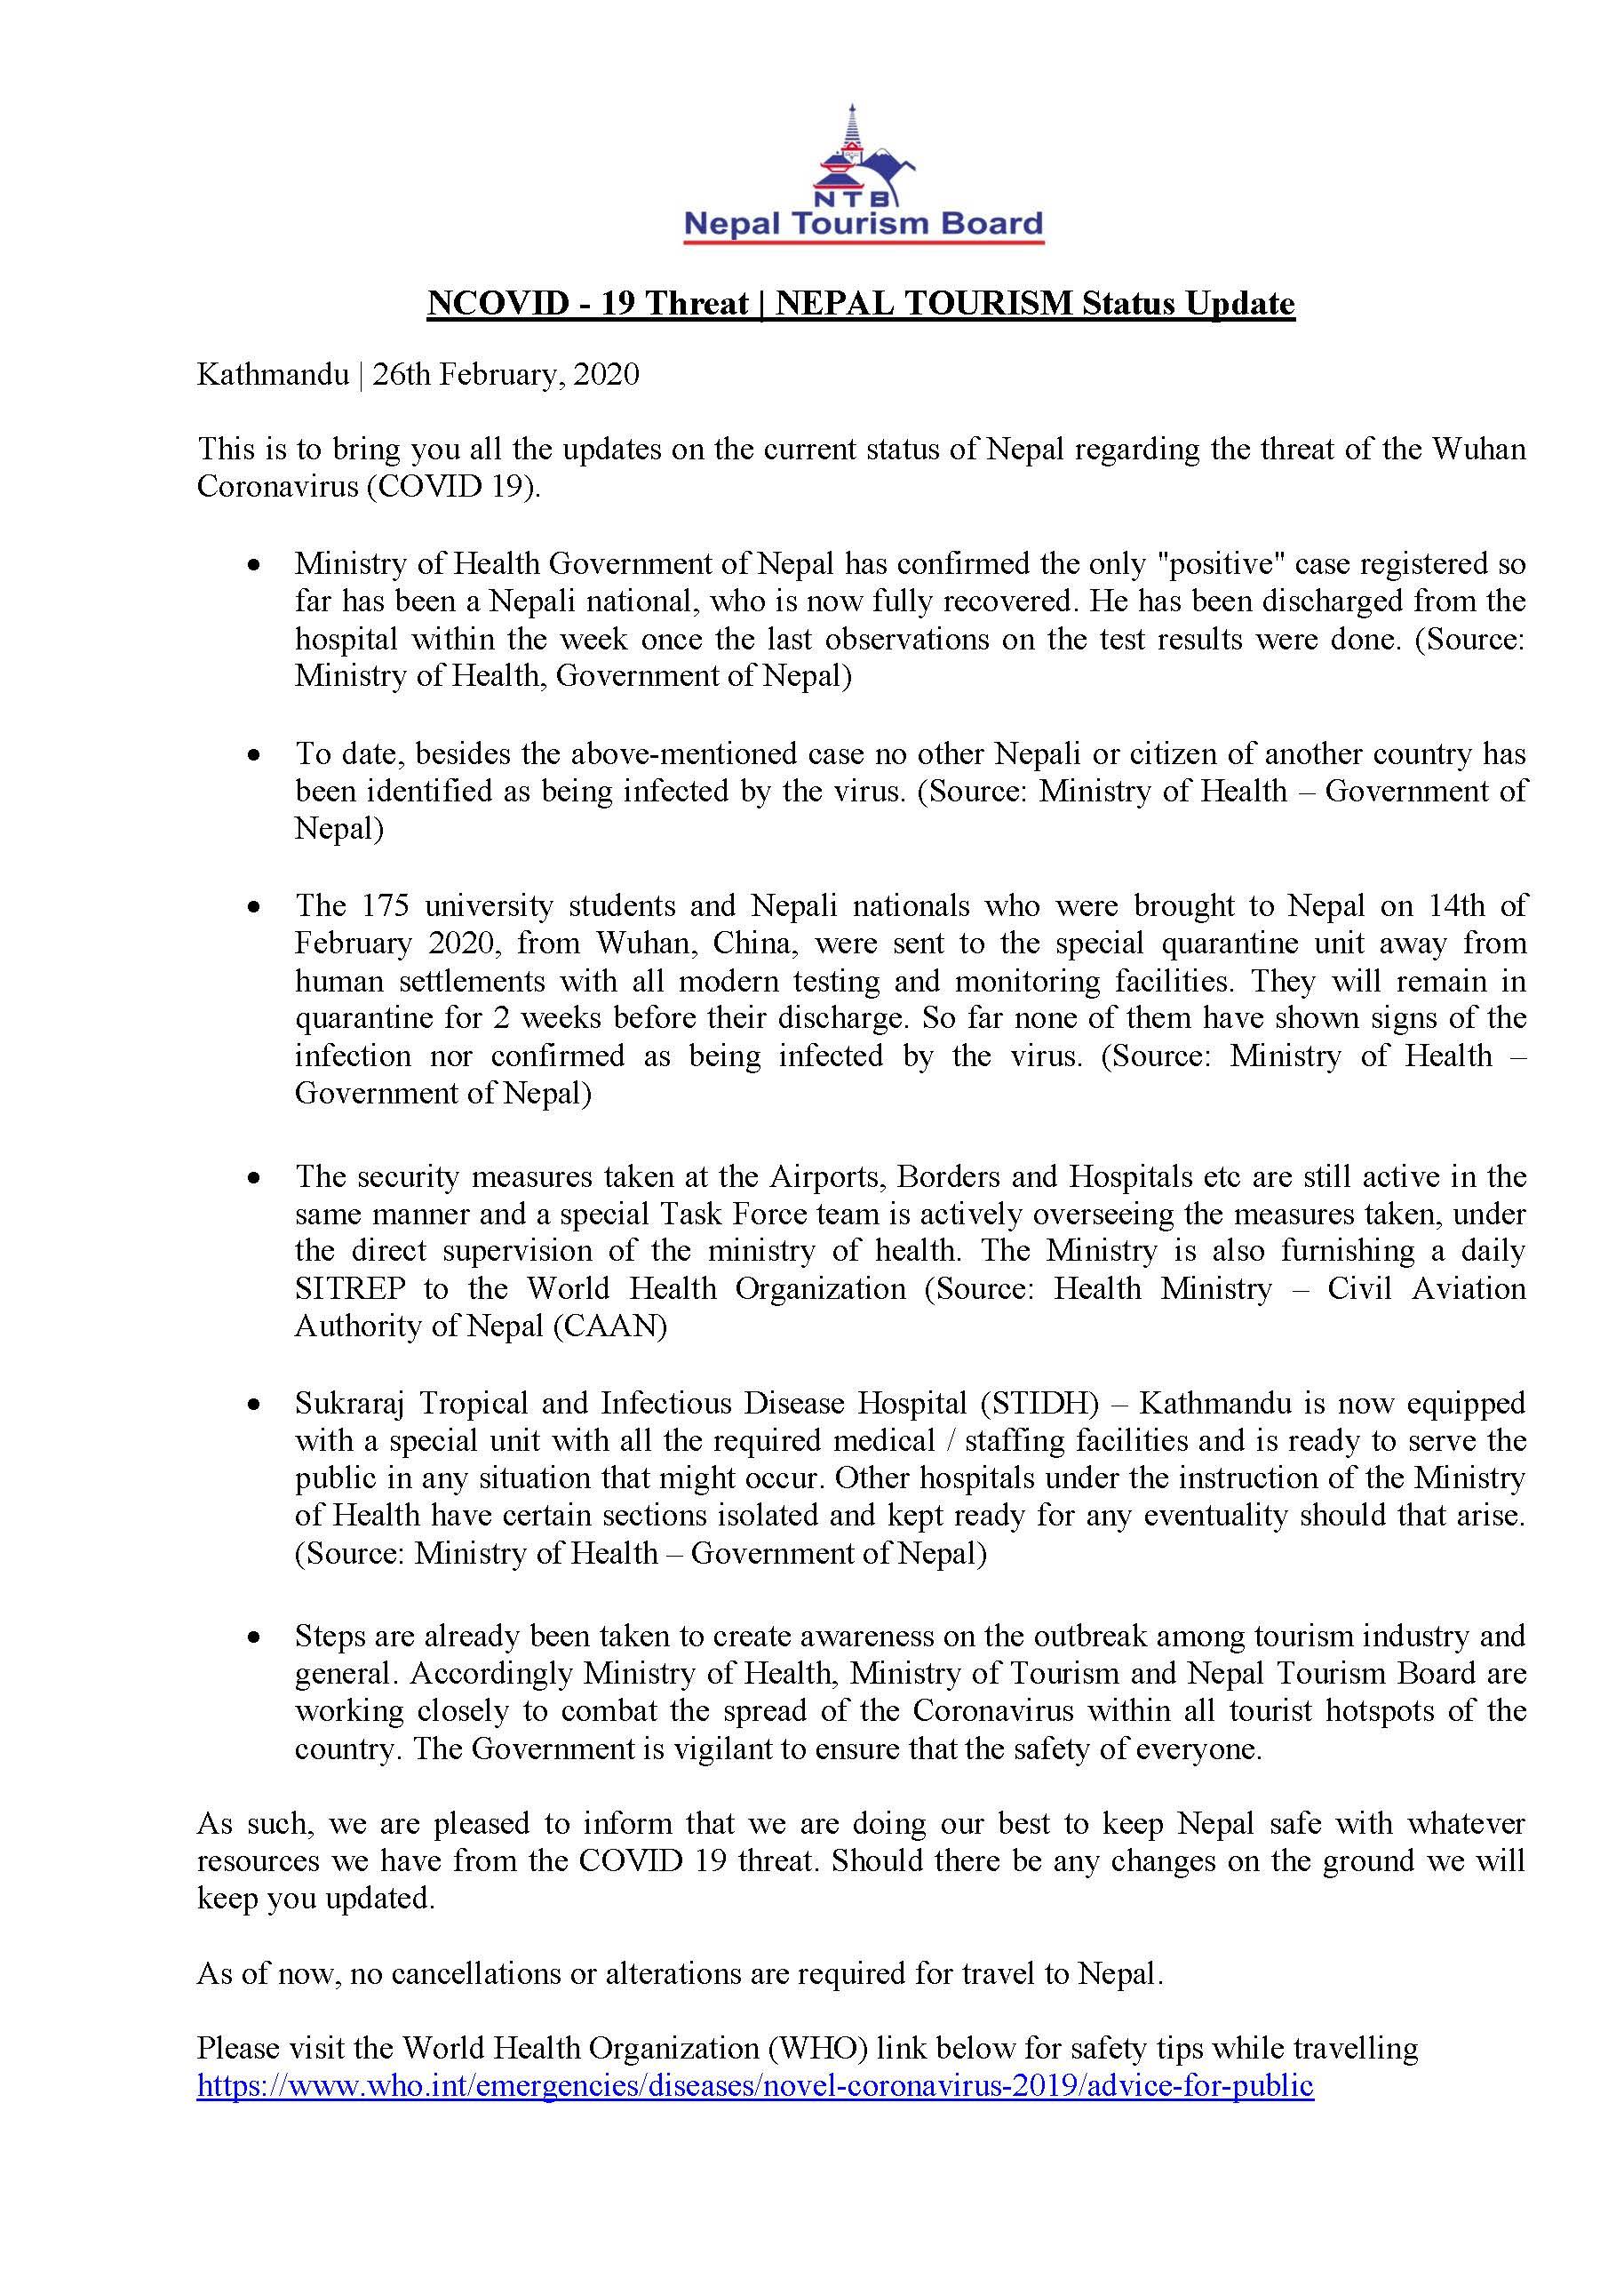 NCOVID 19 Threat Nepal Tourism Status Update 26 Feb 2020